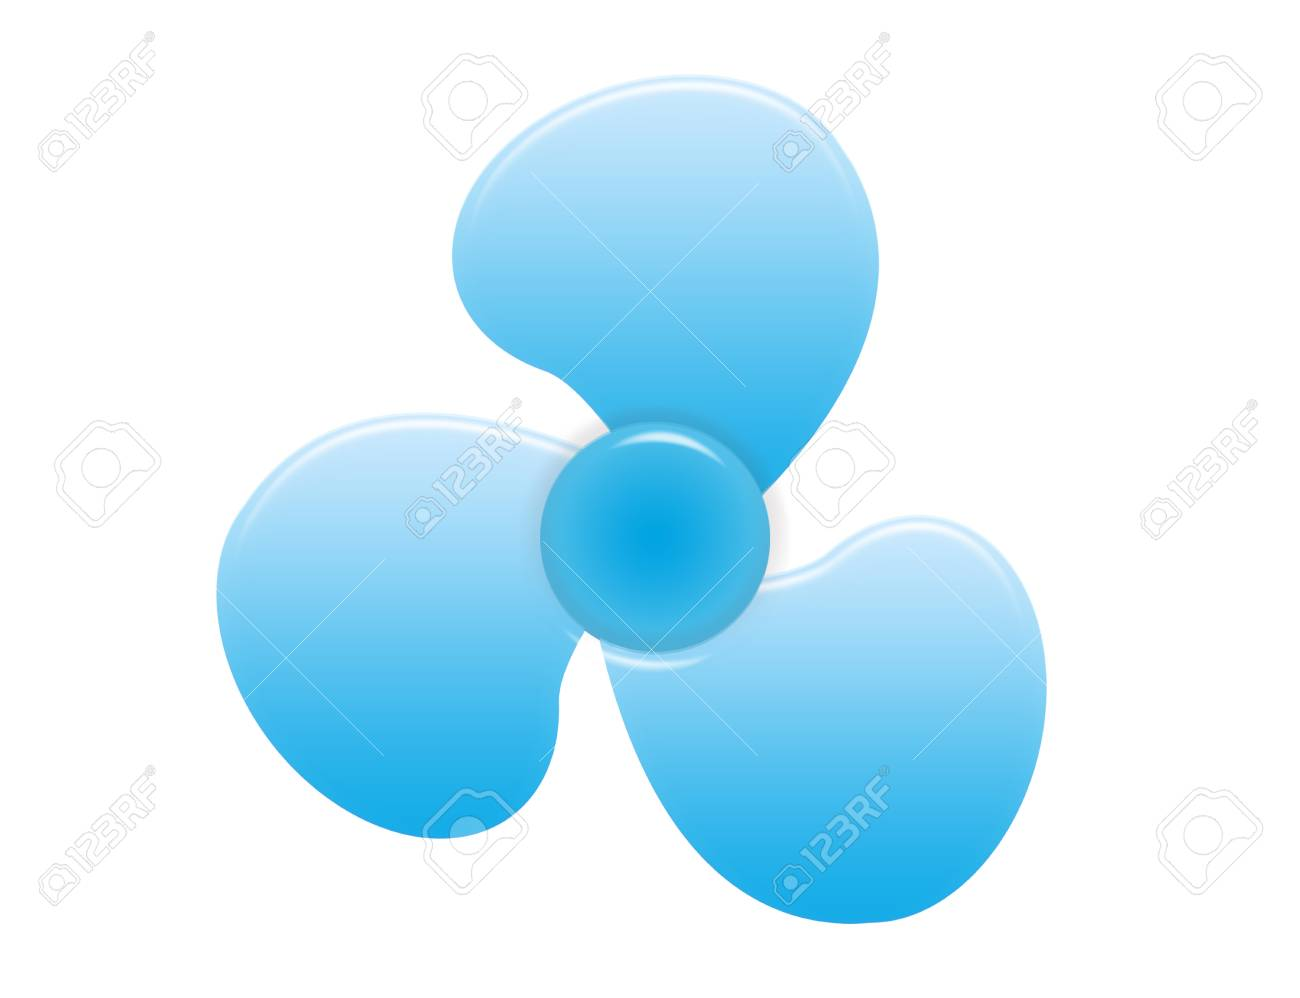 blue prop ventilator isolated over white background.illustration Stock Photo - 9709530